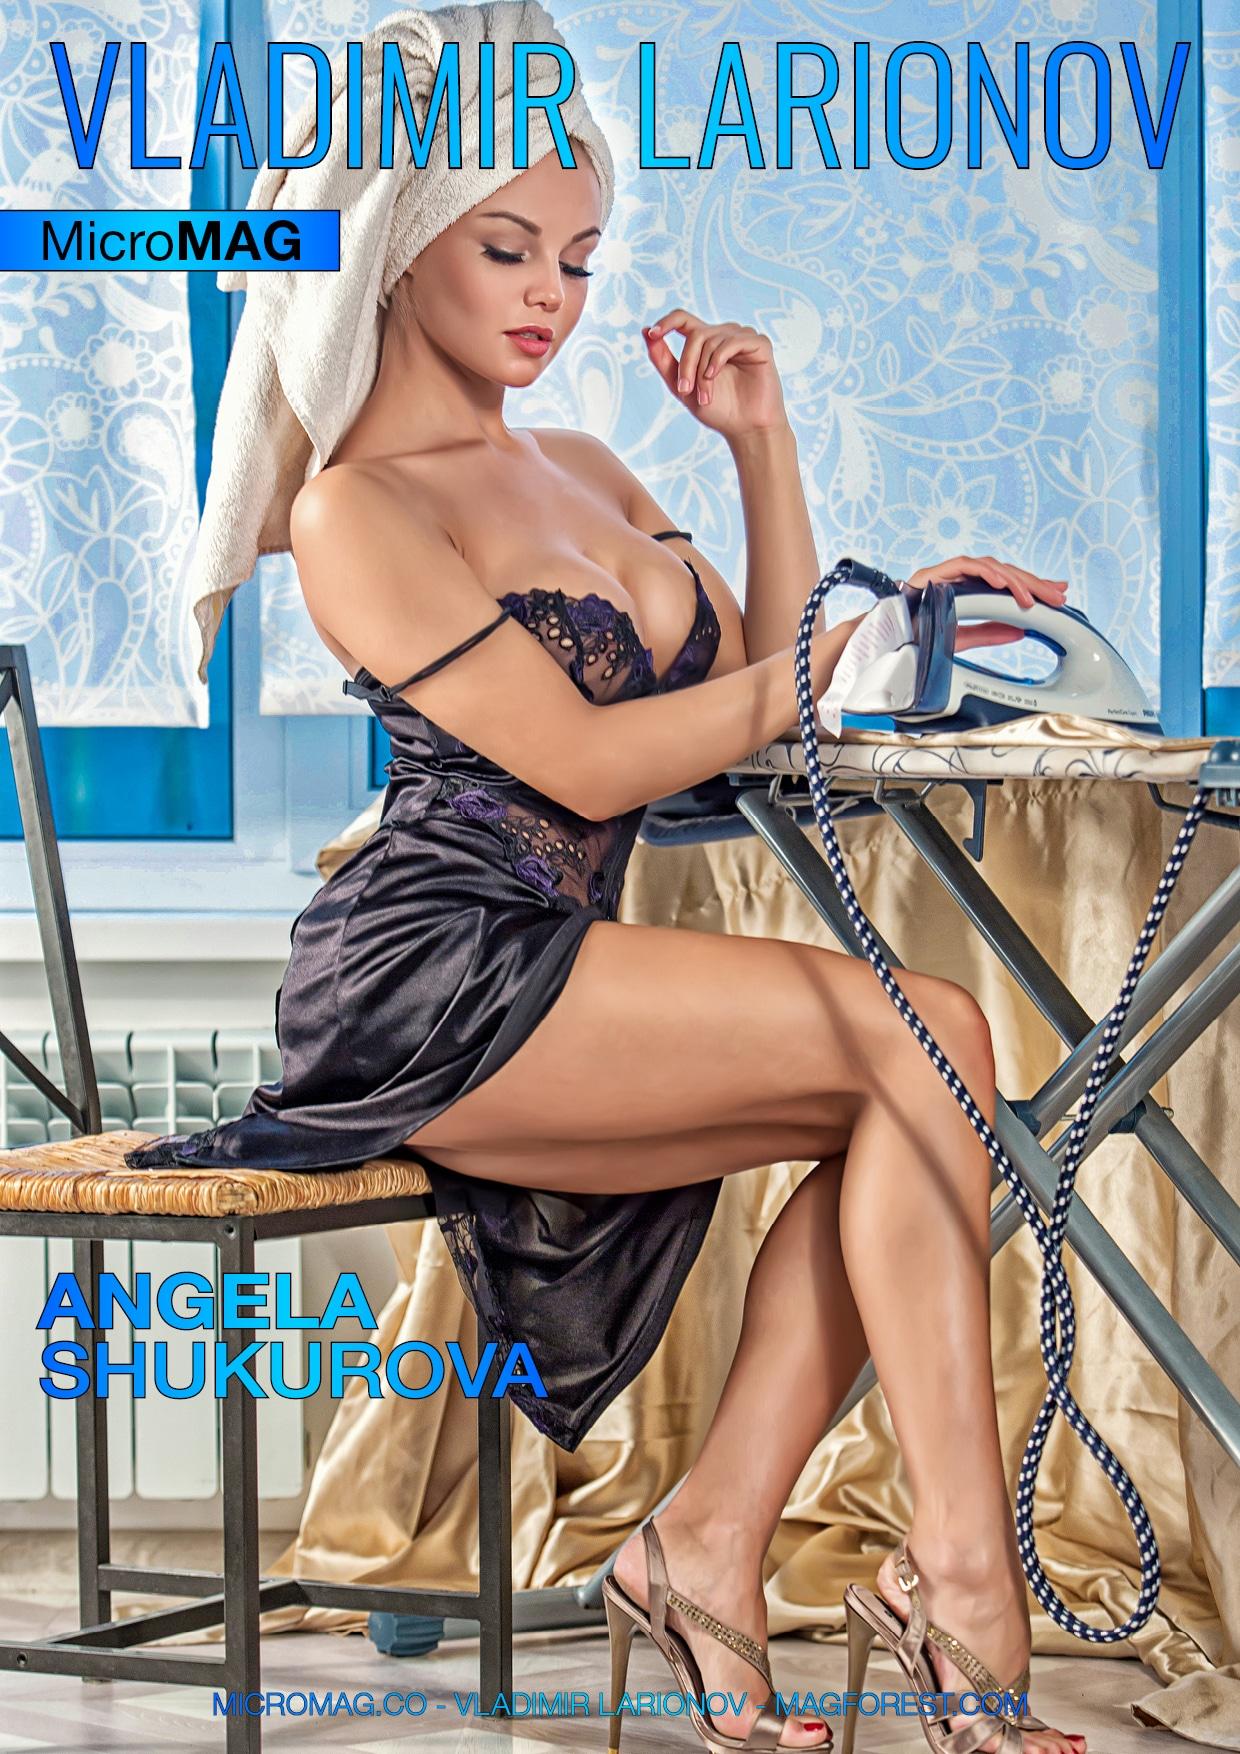 Vladimir Larionov MicroMAG - Angela Shukurova - Issue 2 3